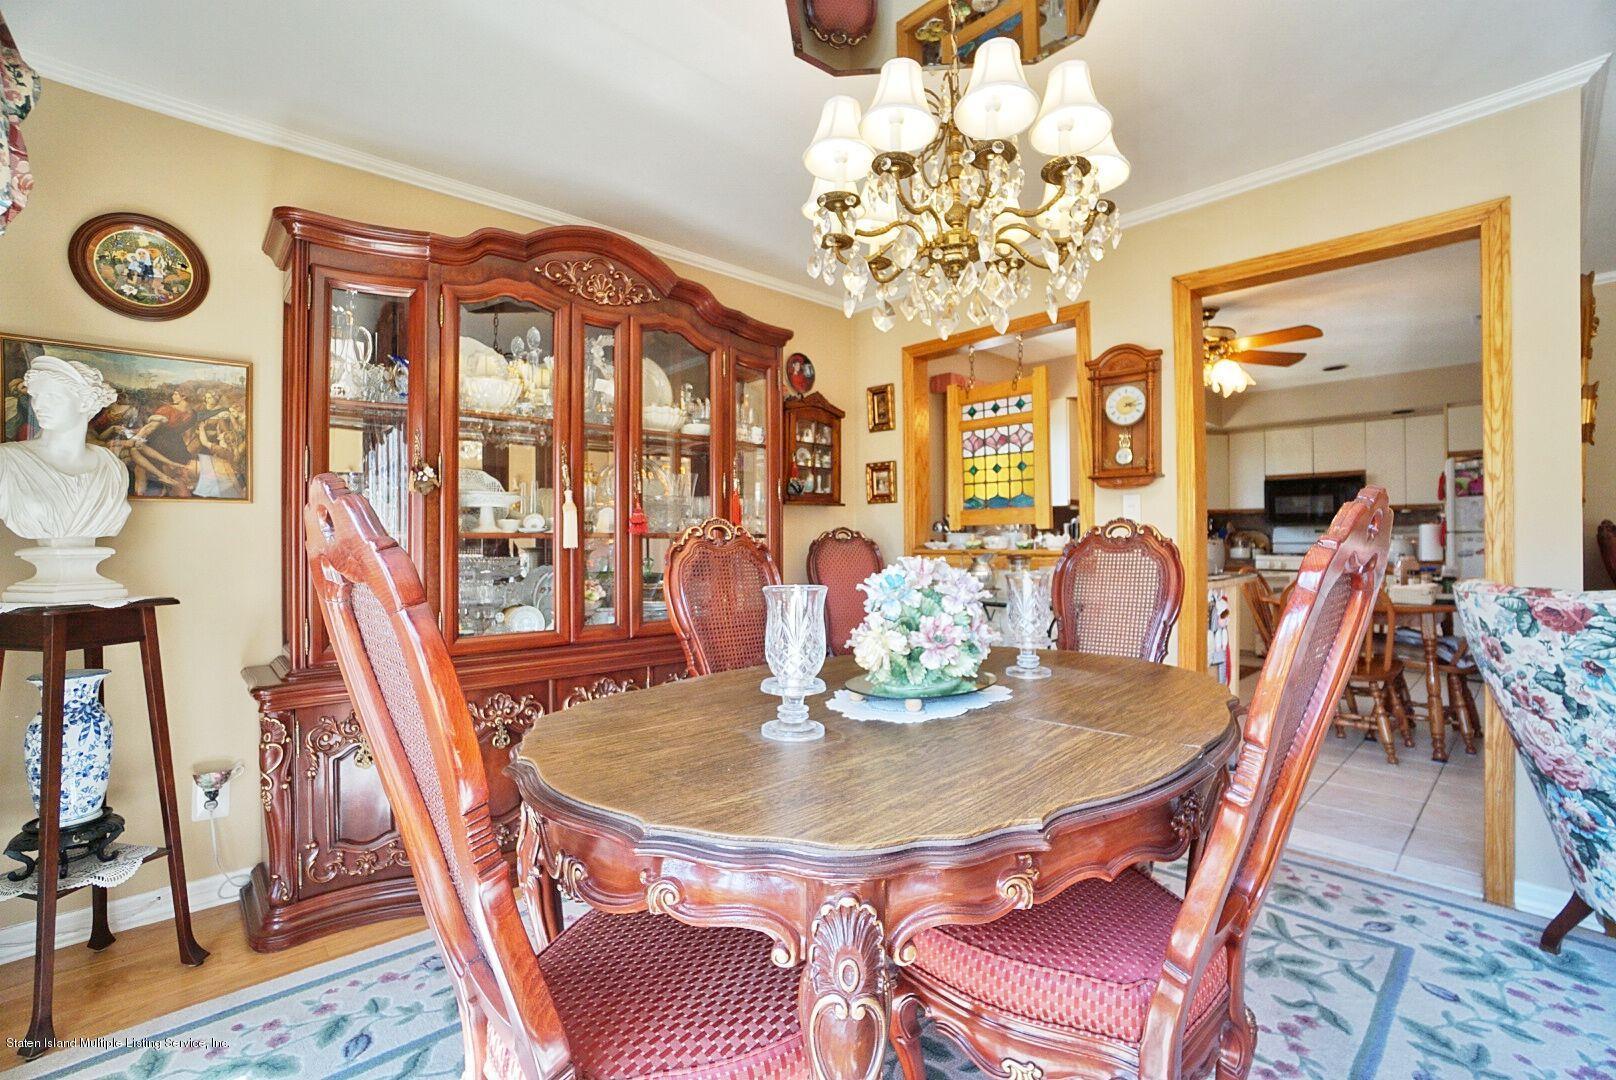 Single Family - Detached 283 Holdridge Avenue  Staten Island, NY 10312, MLS-1130000-9